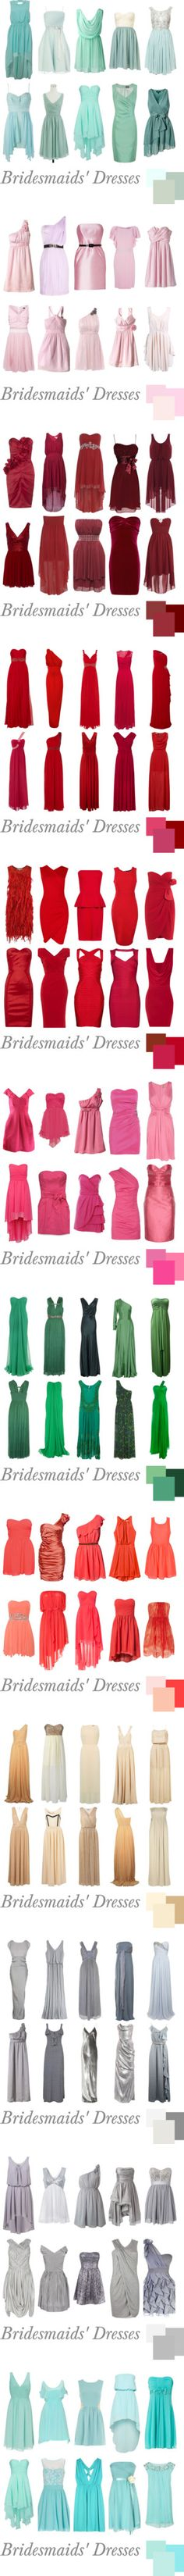 bridesmaids, idea, someday, futur, style, stuff, dream, bridesmaid dresses, colors